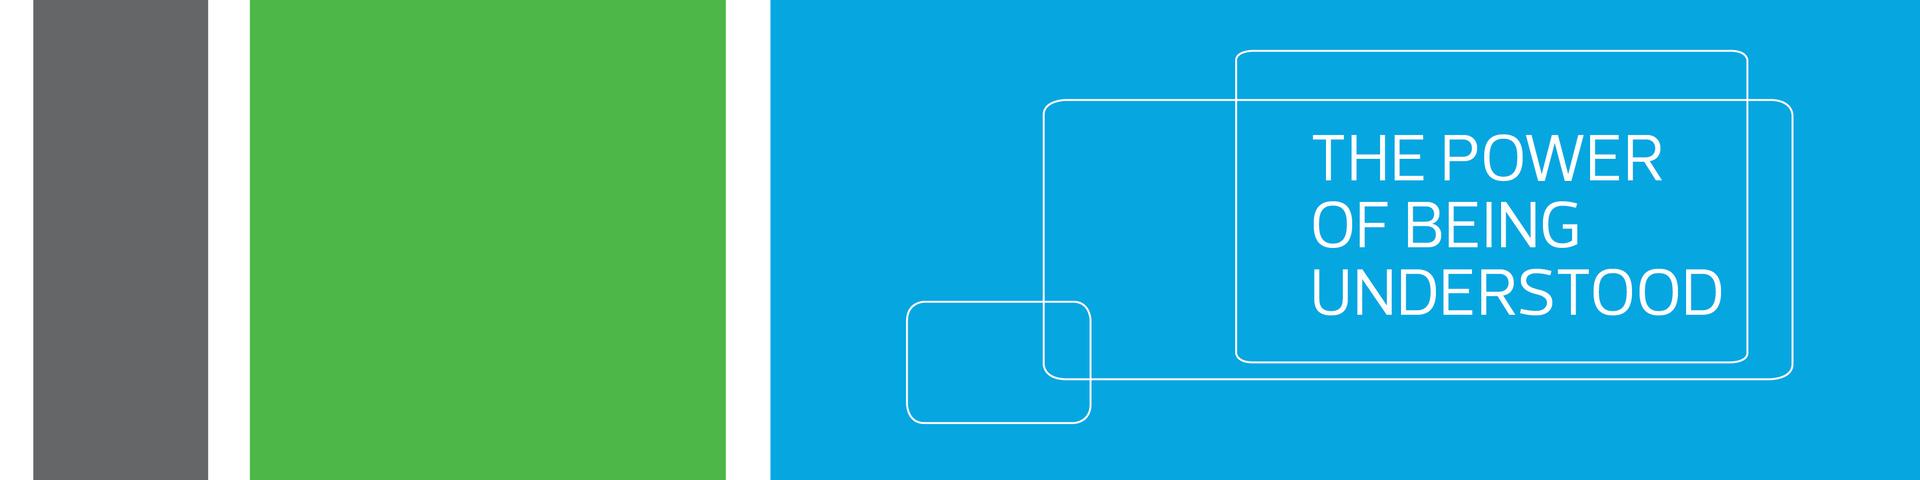 Linkedin RSM Cover-01